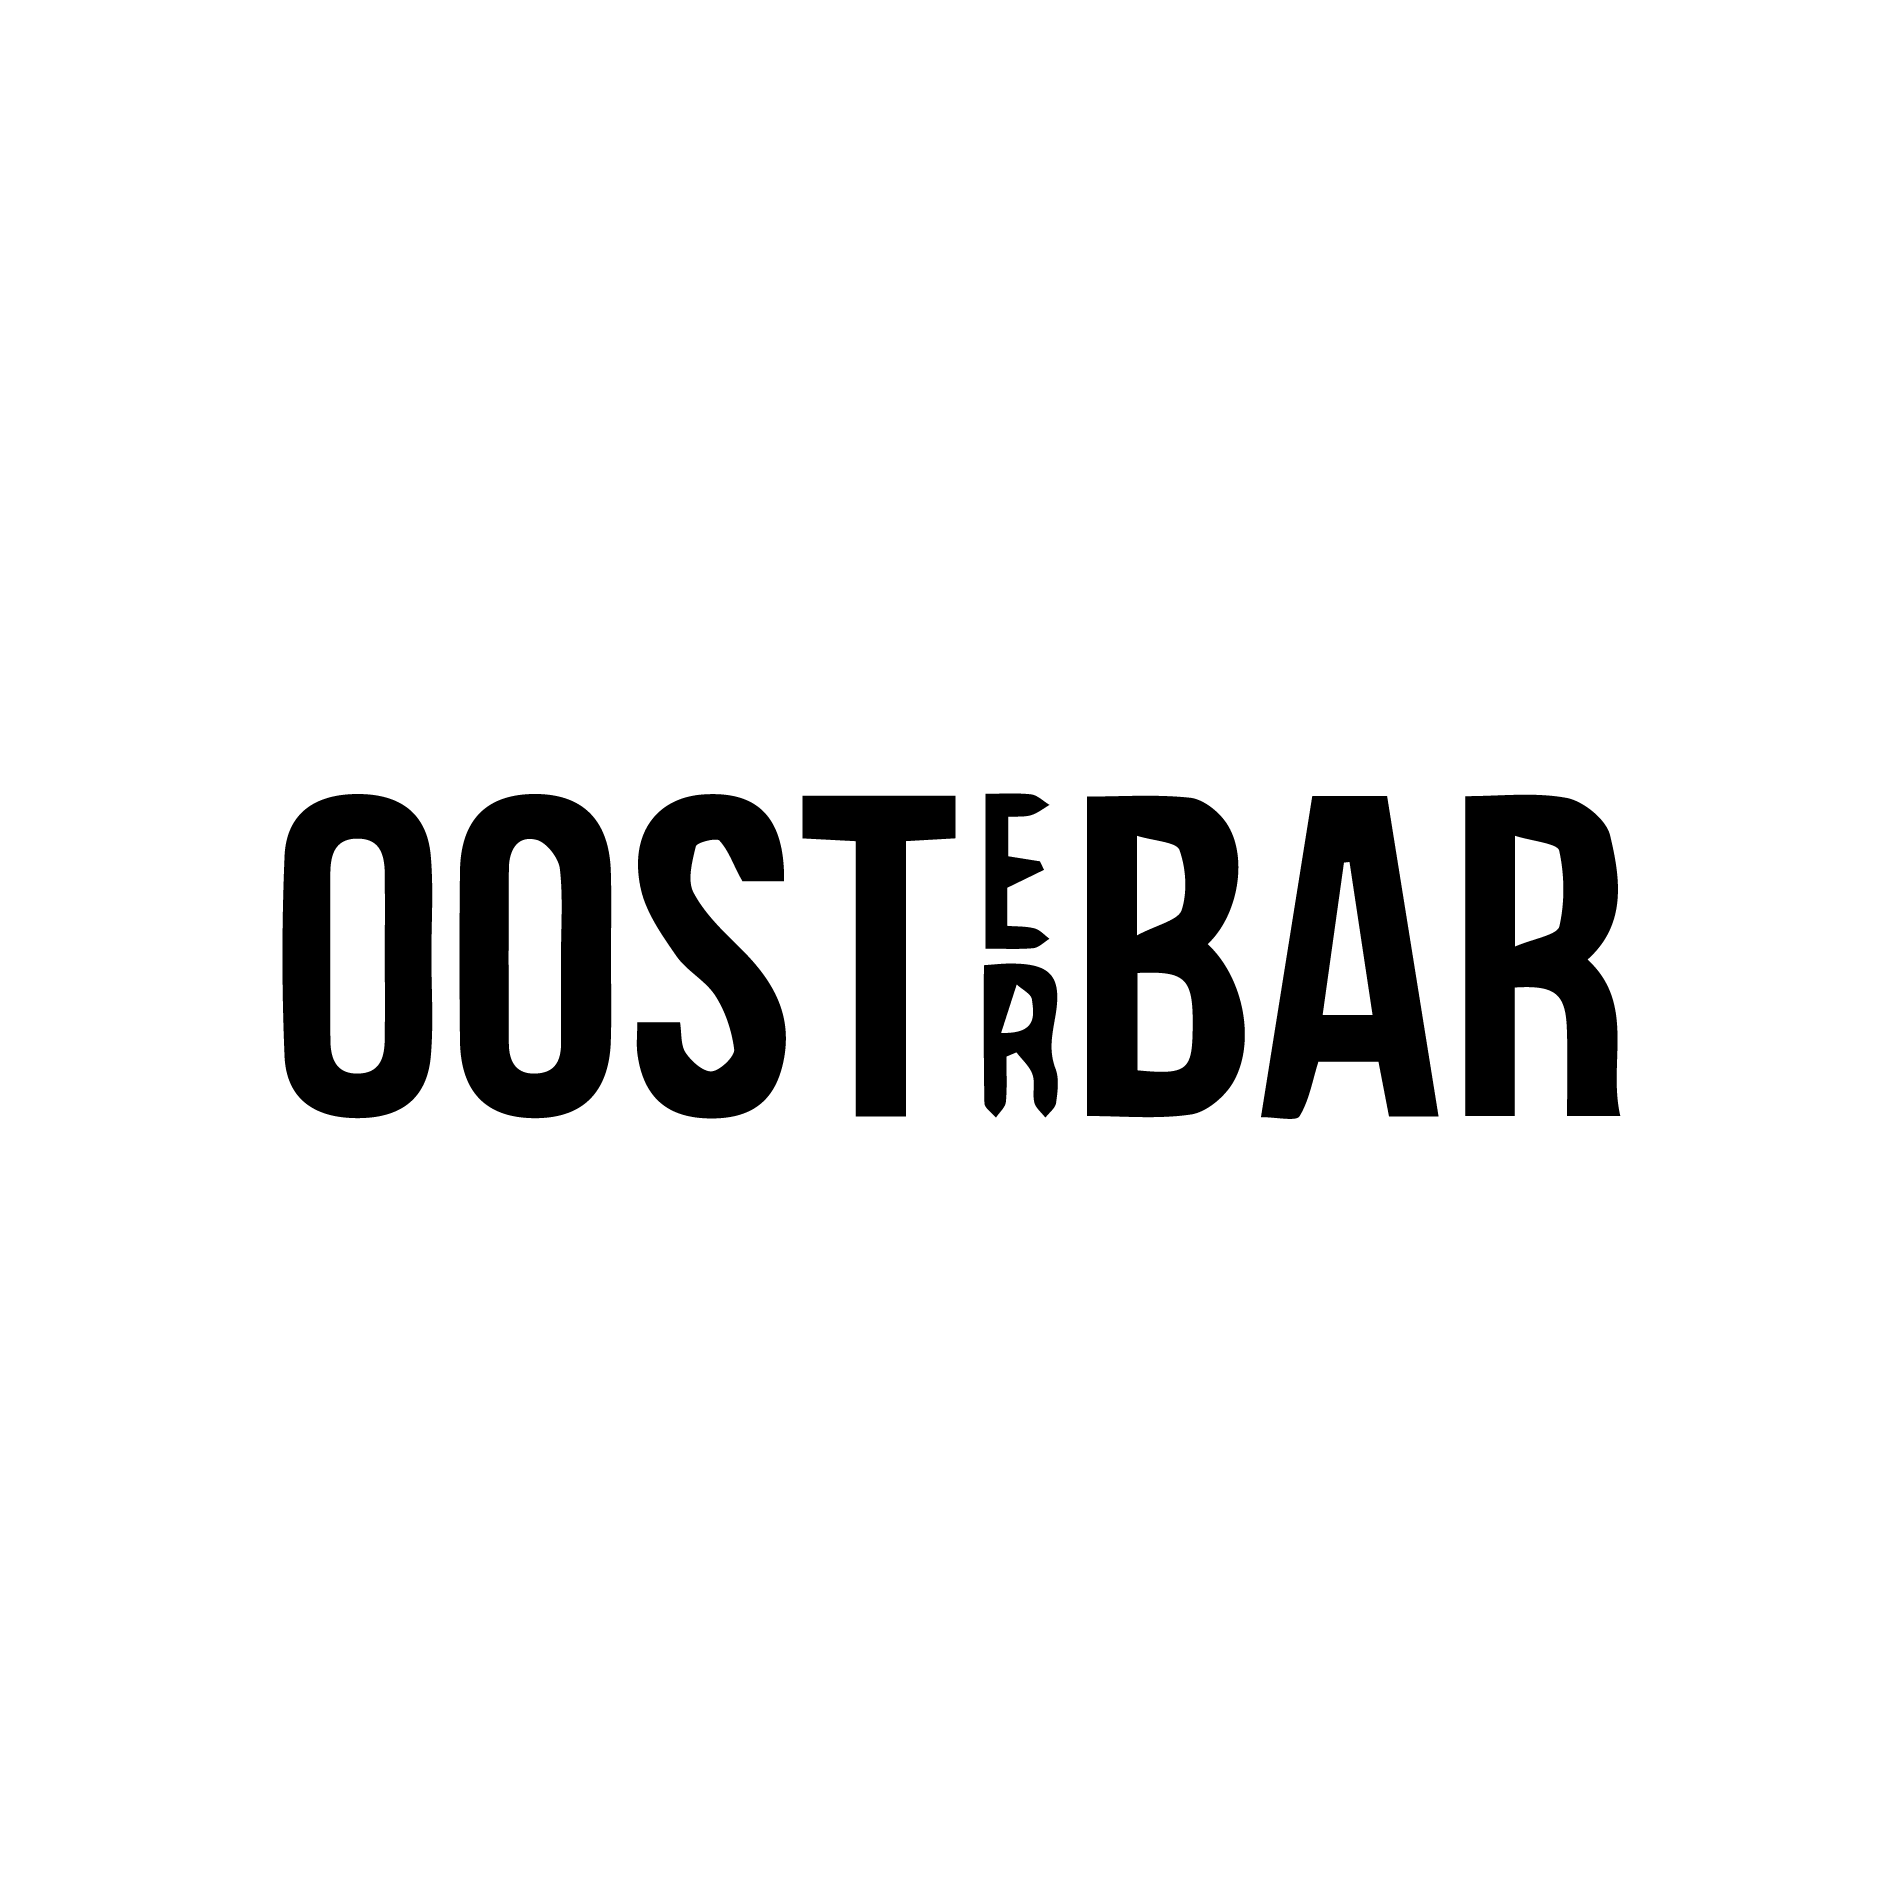 Oosterbar Logo